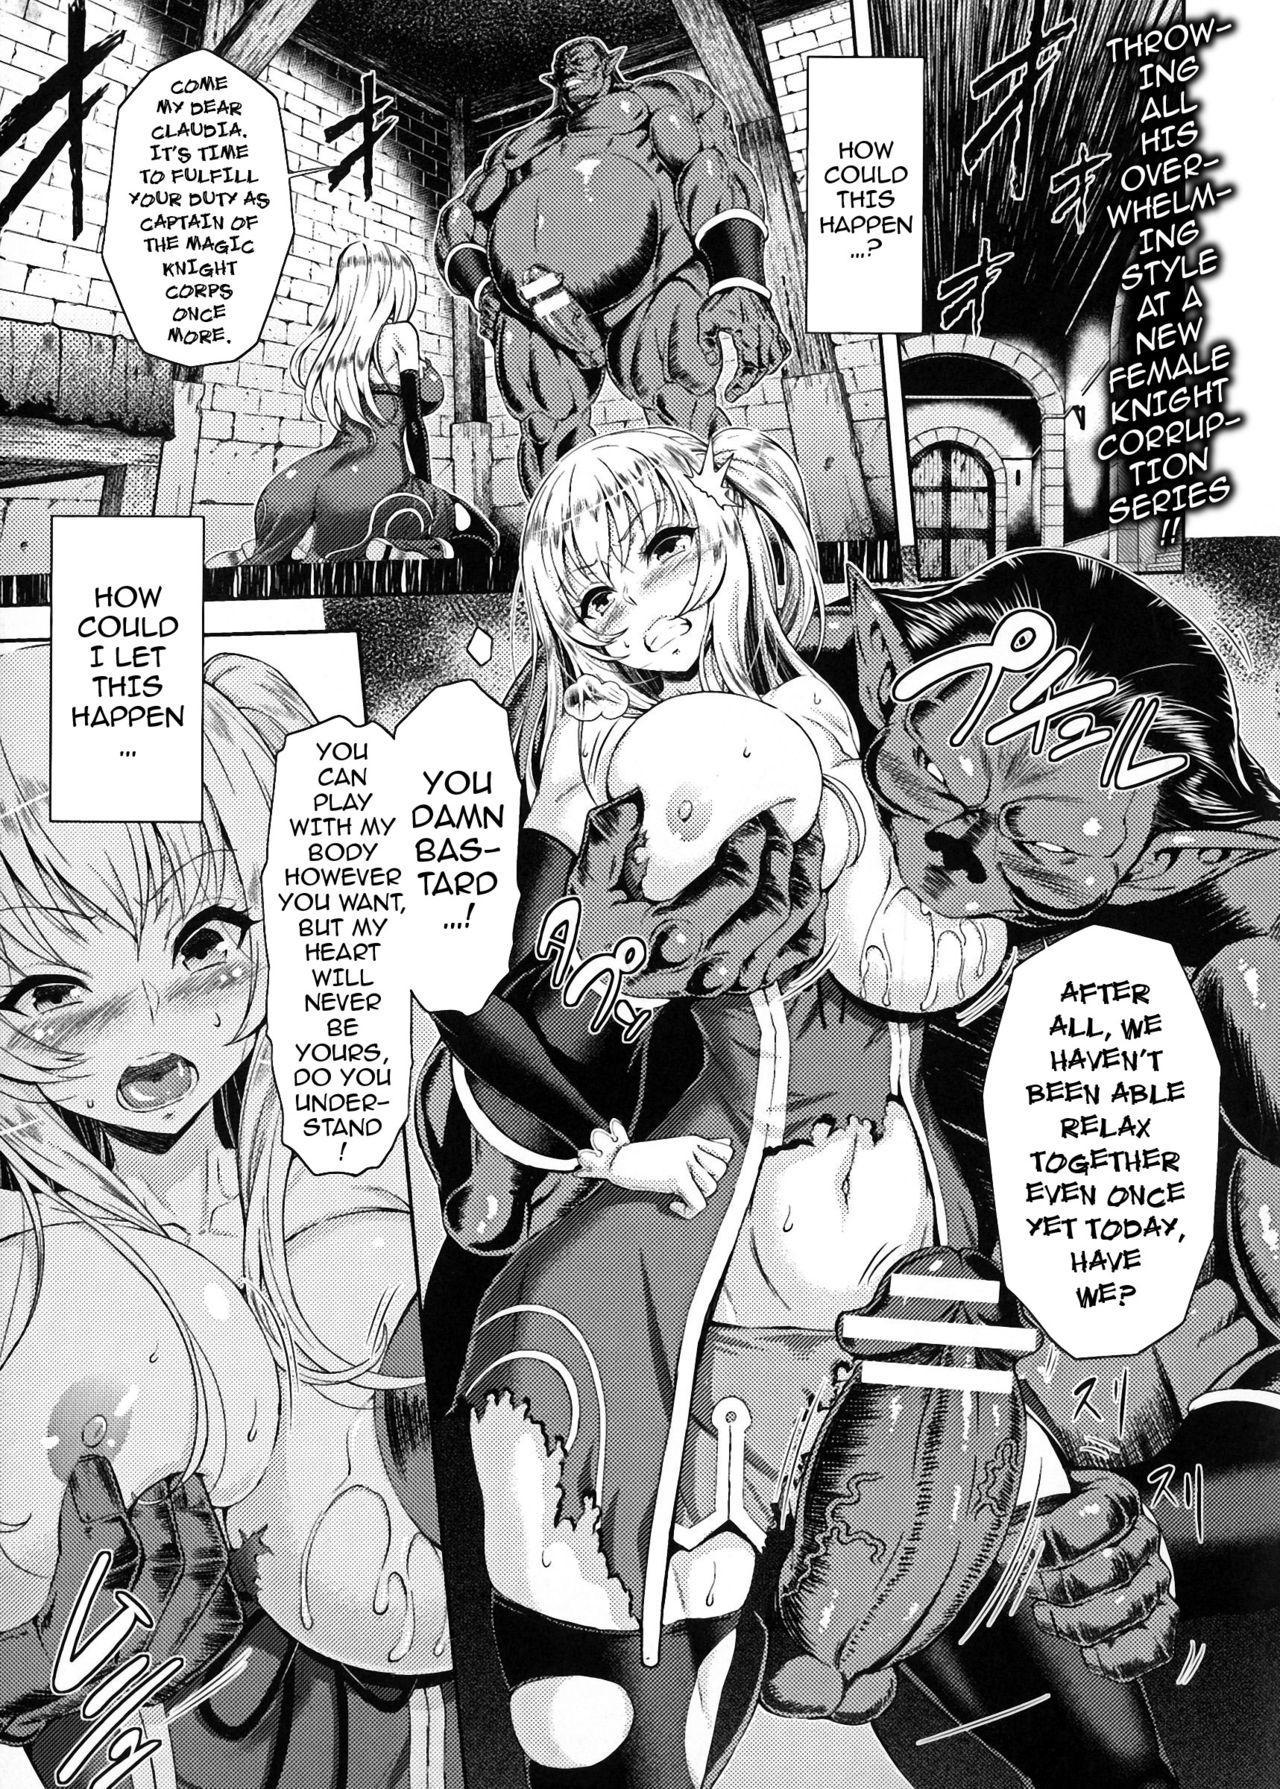 [Yamada Gogogo] Erona ~Orc no Inmon ni Okasareta Onna Kishi no Matsuro~ | Erona ~The Fall of a Beautiful Knight Cursed with the Lewd Mark of an Orc~ Ch. 1-3 [English] {darknight} 1